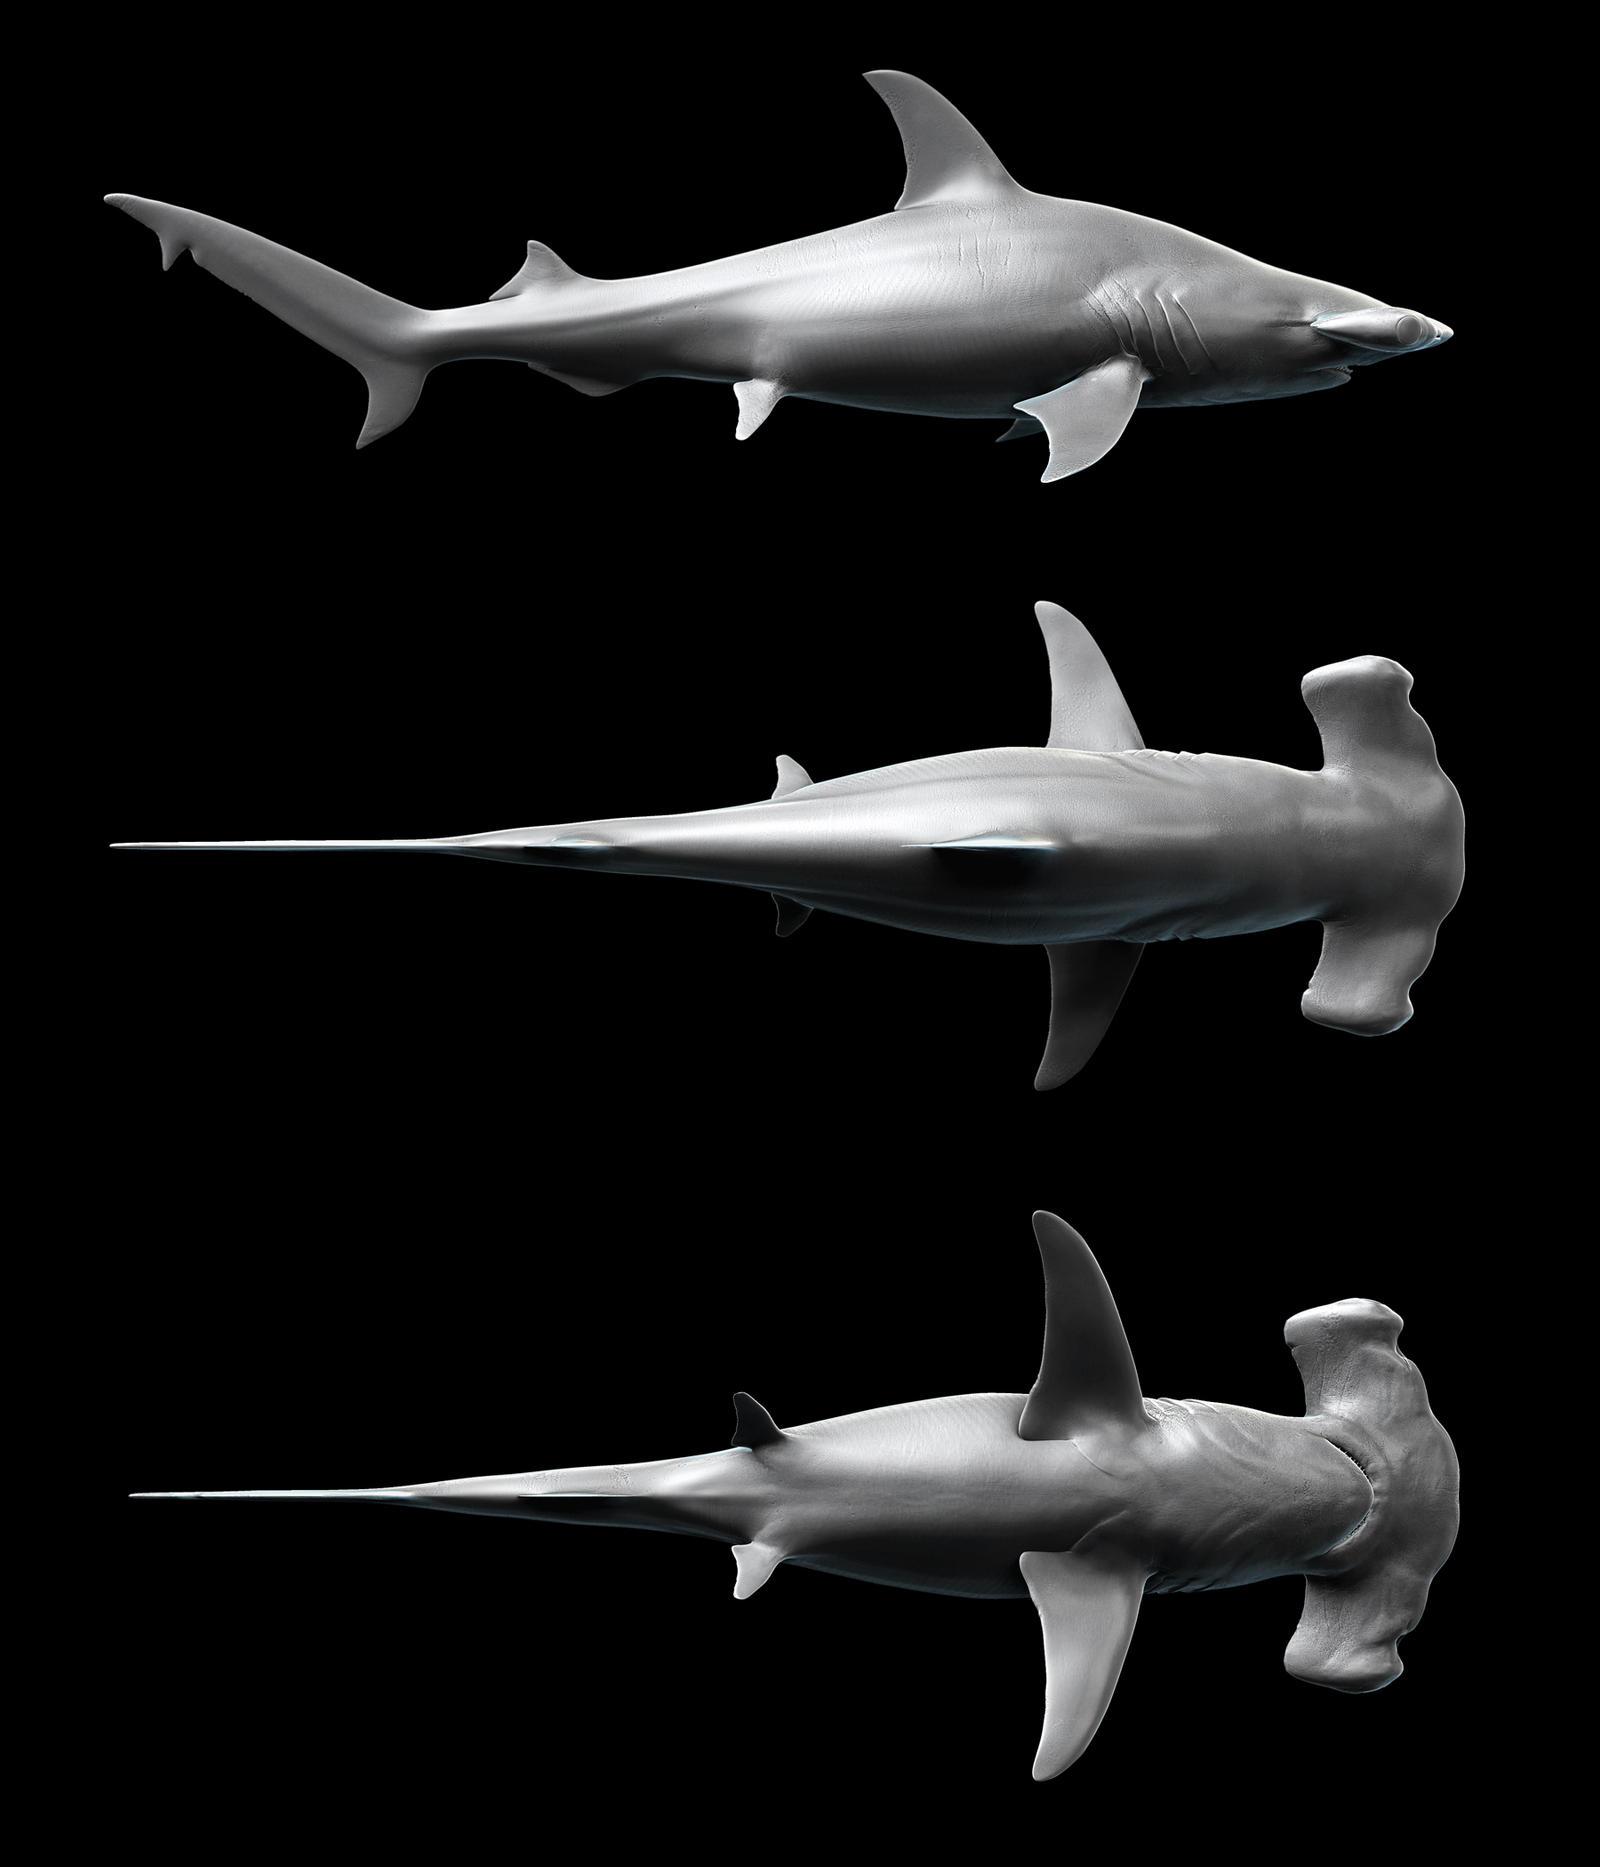 The Shark Gallery - Shark Facts and Information ... Hammerhead Shark ...